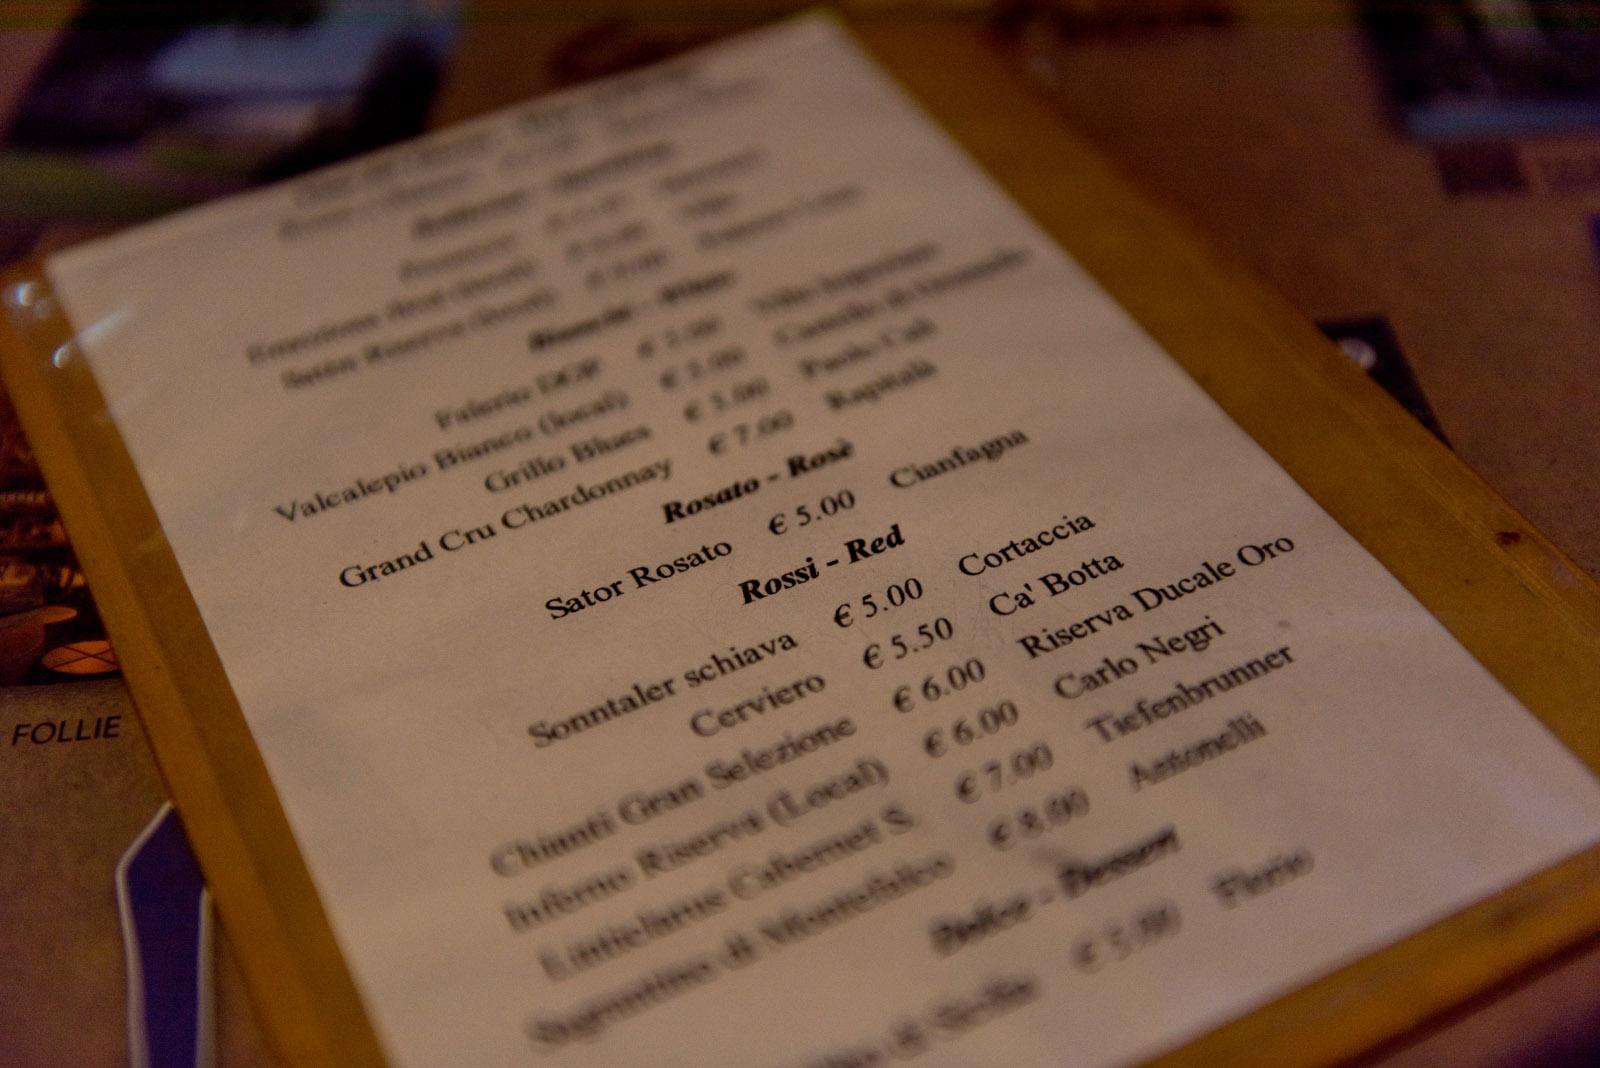 wijnbar cantina follie, enoteca, tremezzina, comomeer